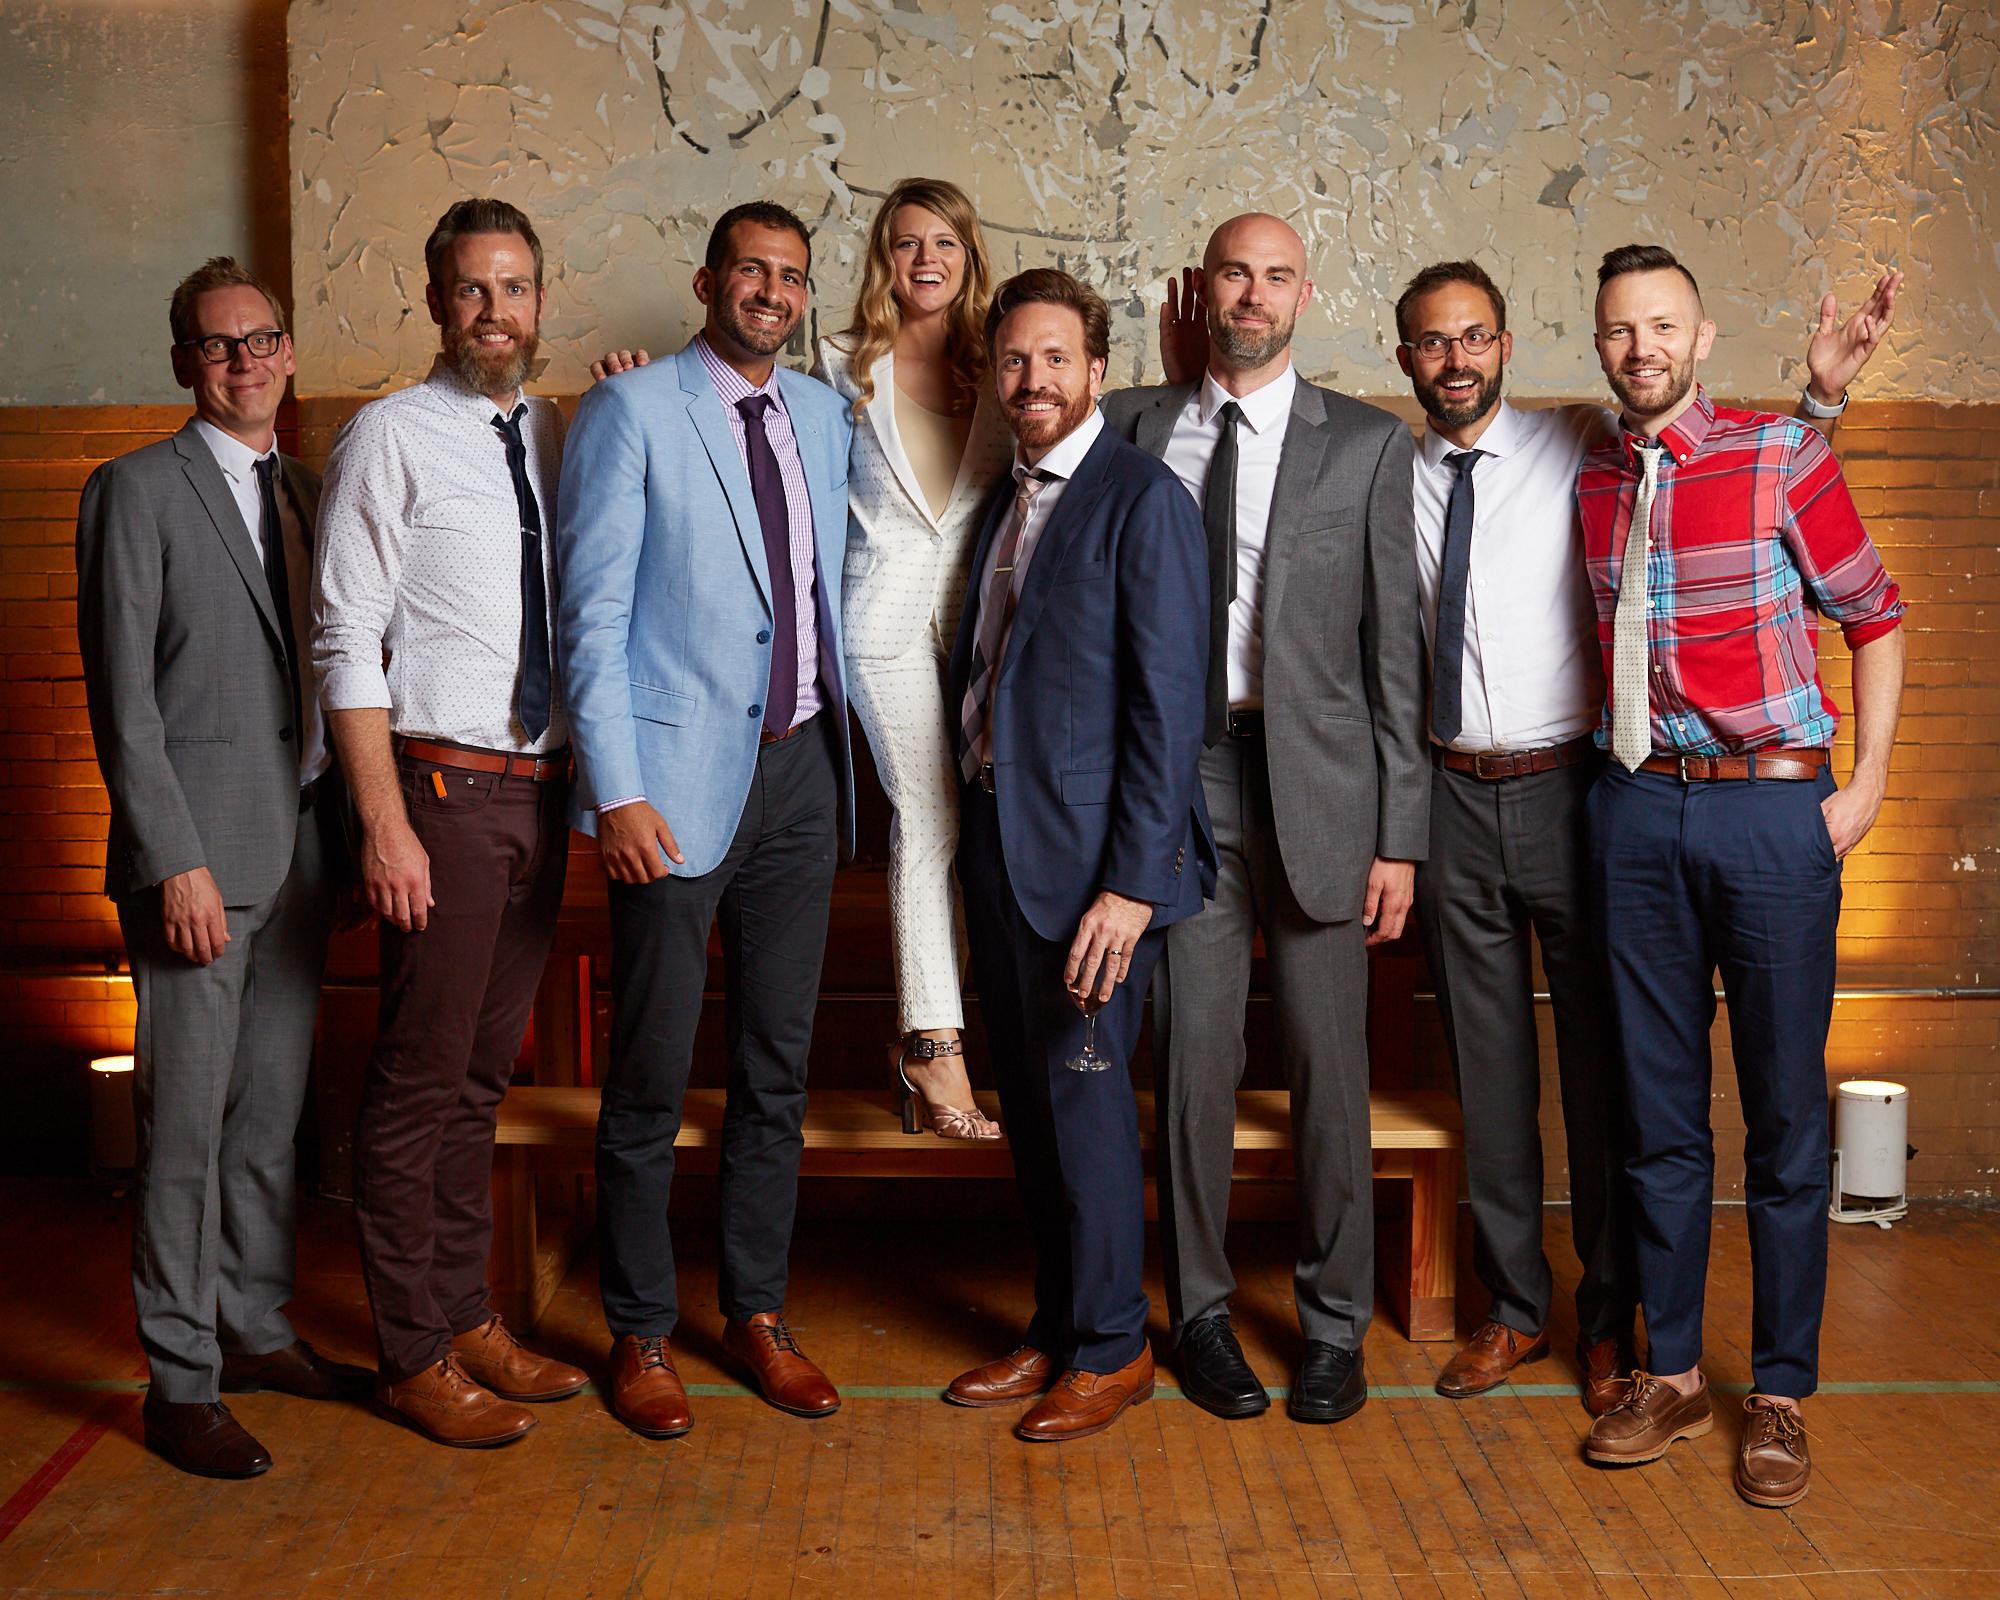 Ryan Hannah Sims - 2017.09 - Wedding Photos - 1112.jpg